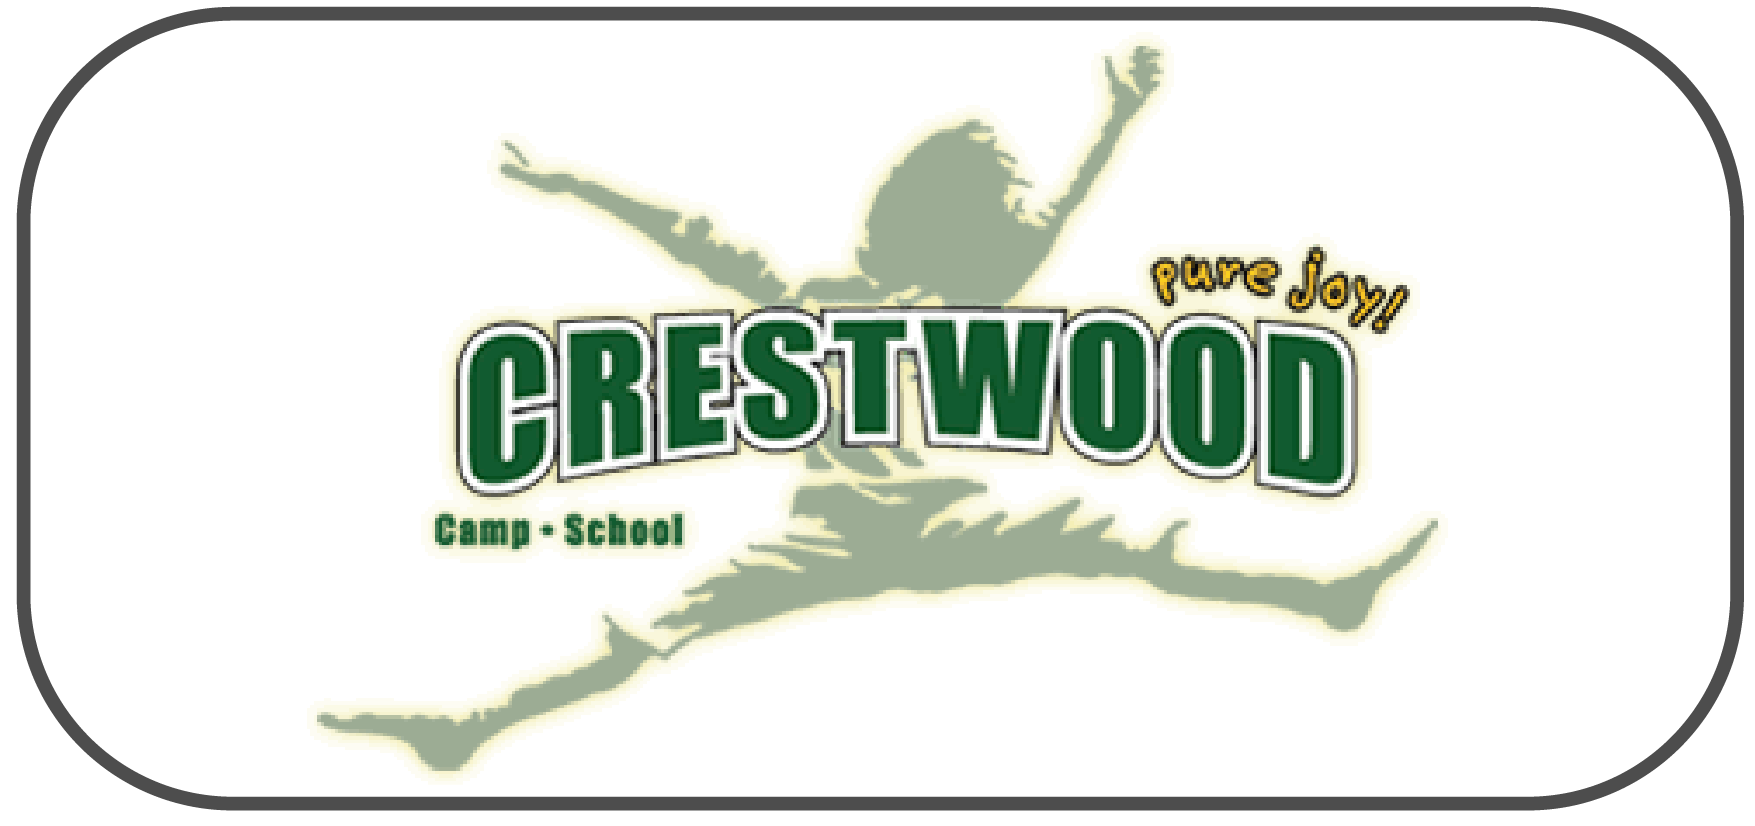 Crestwood Camp